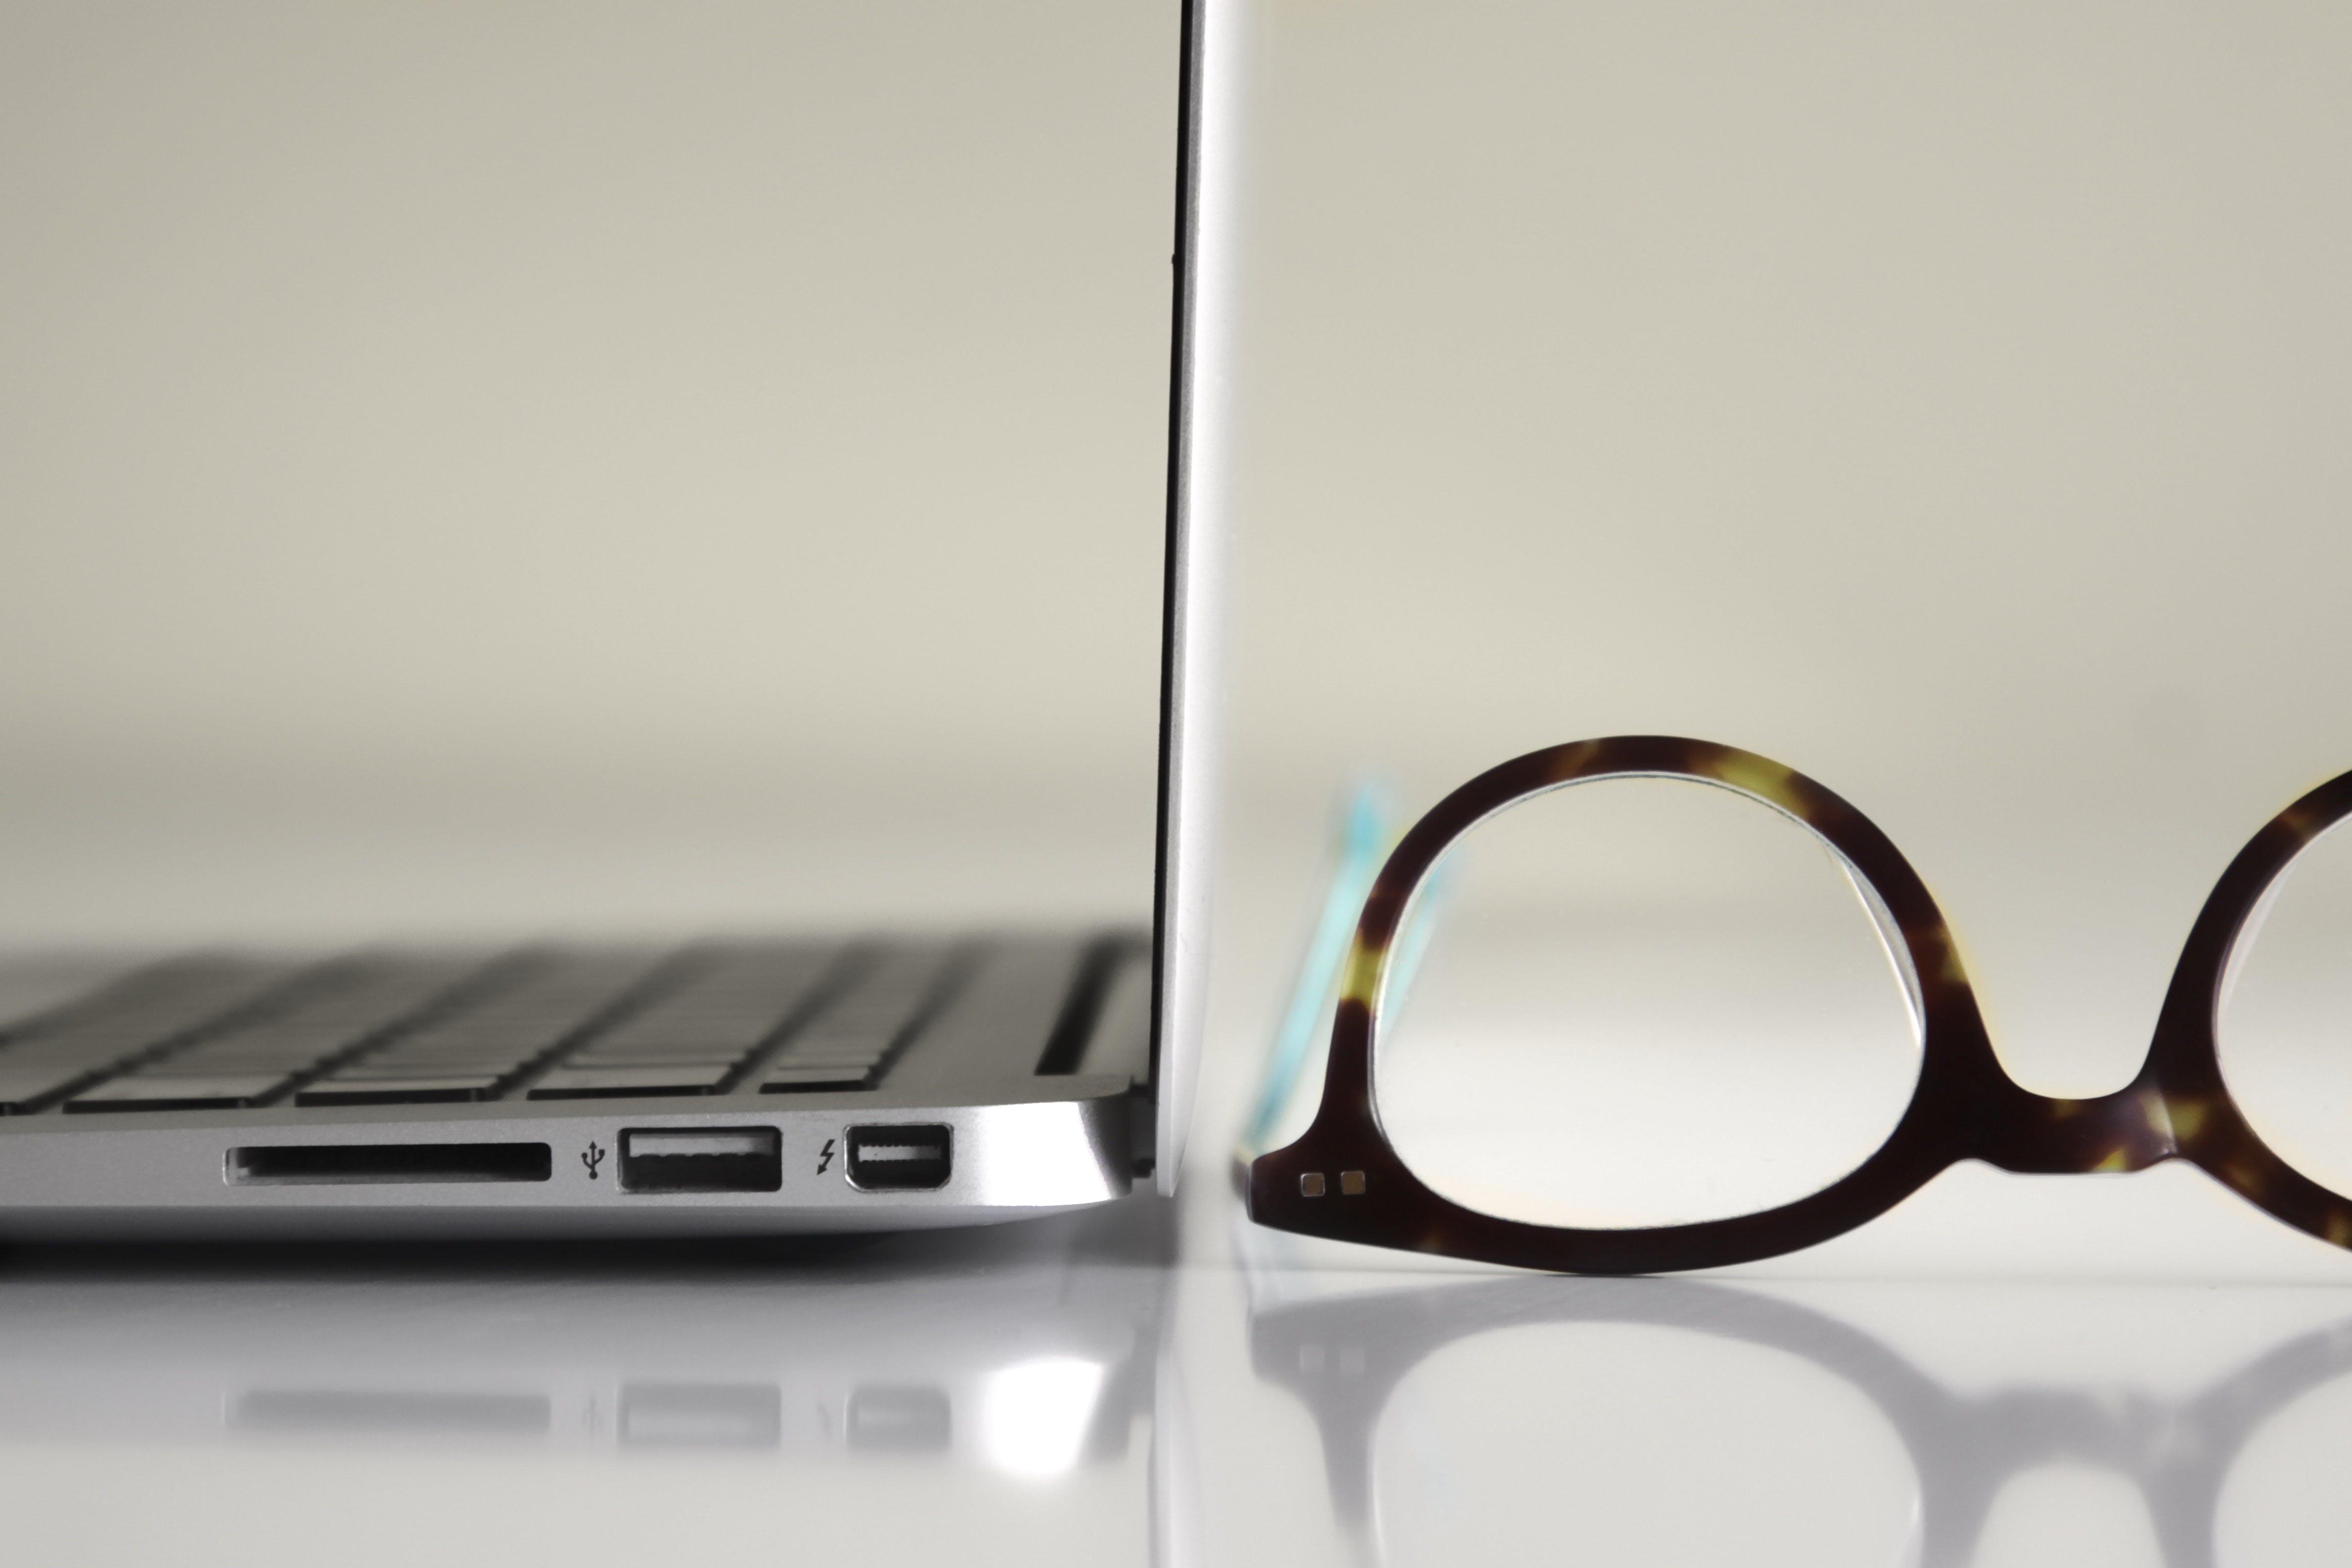 Black Framed Eyeglasses Beside Laptop Computer